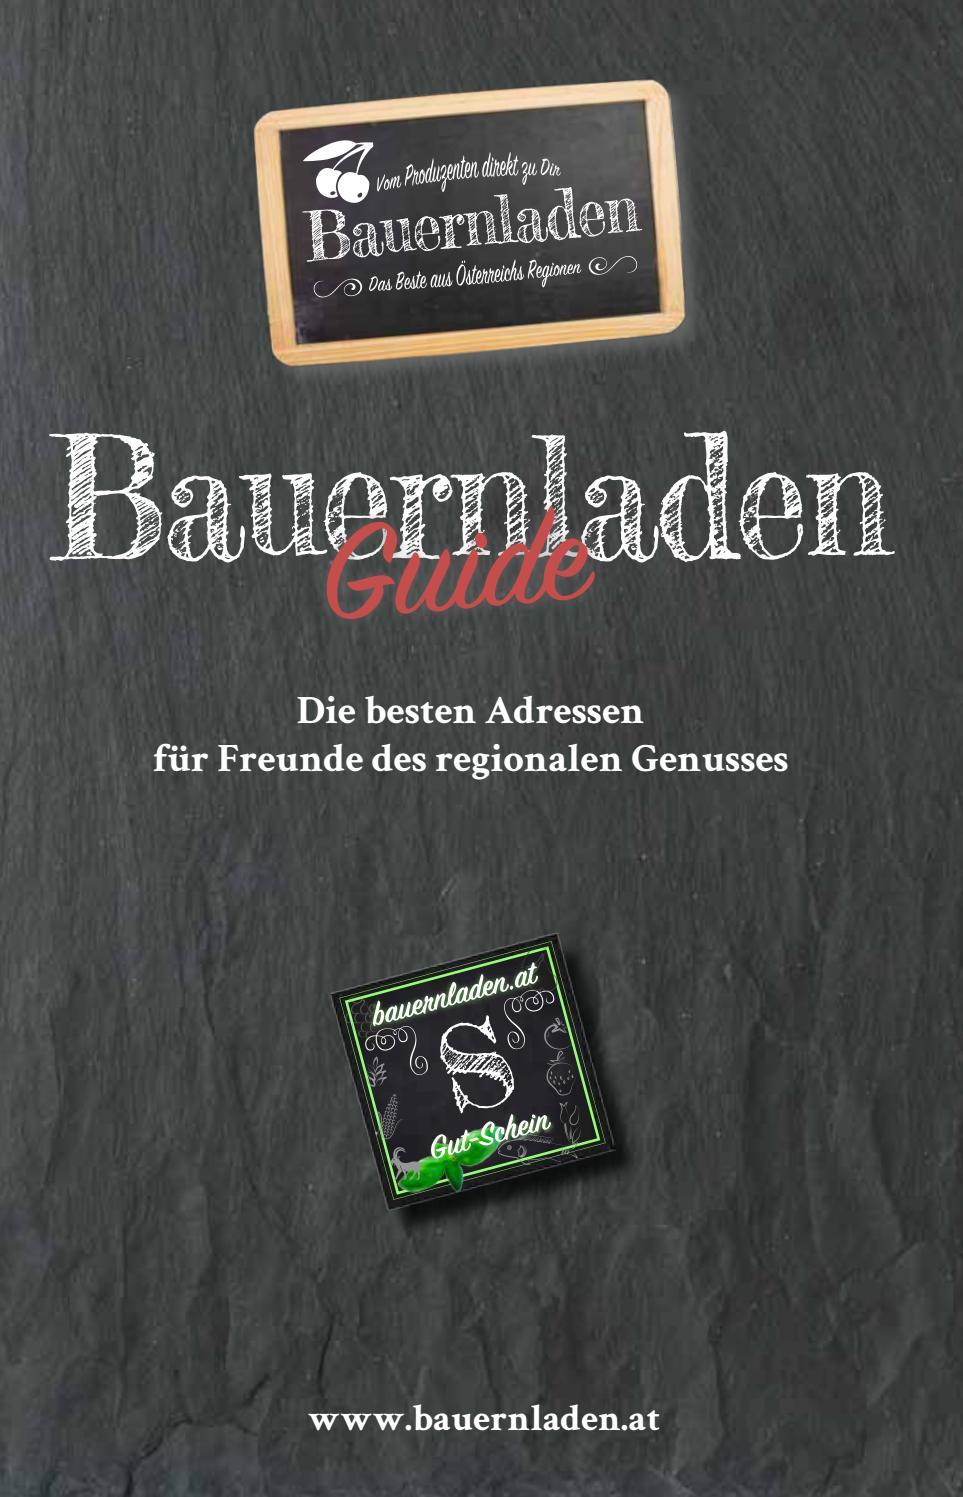 Meine stadt single in salzburg: Single flirt in gainfarn